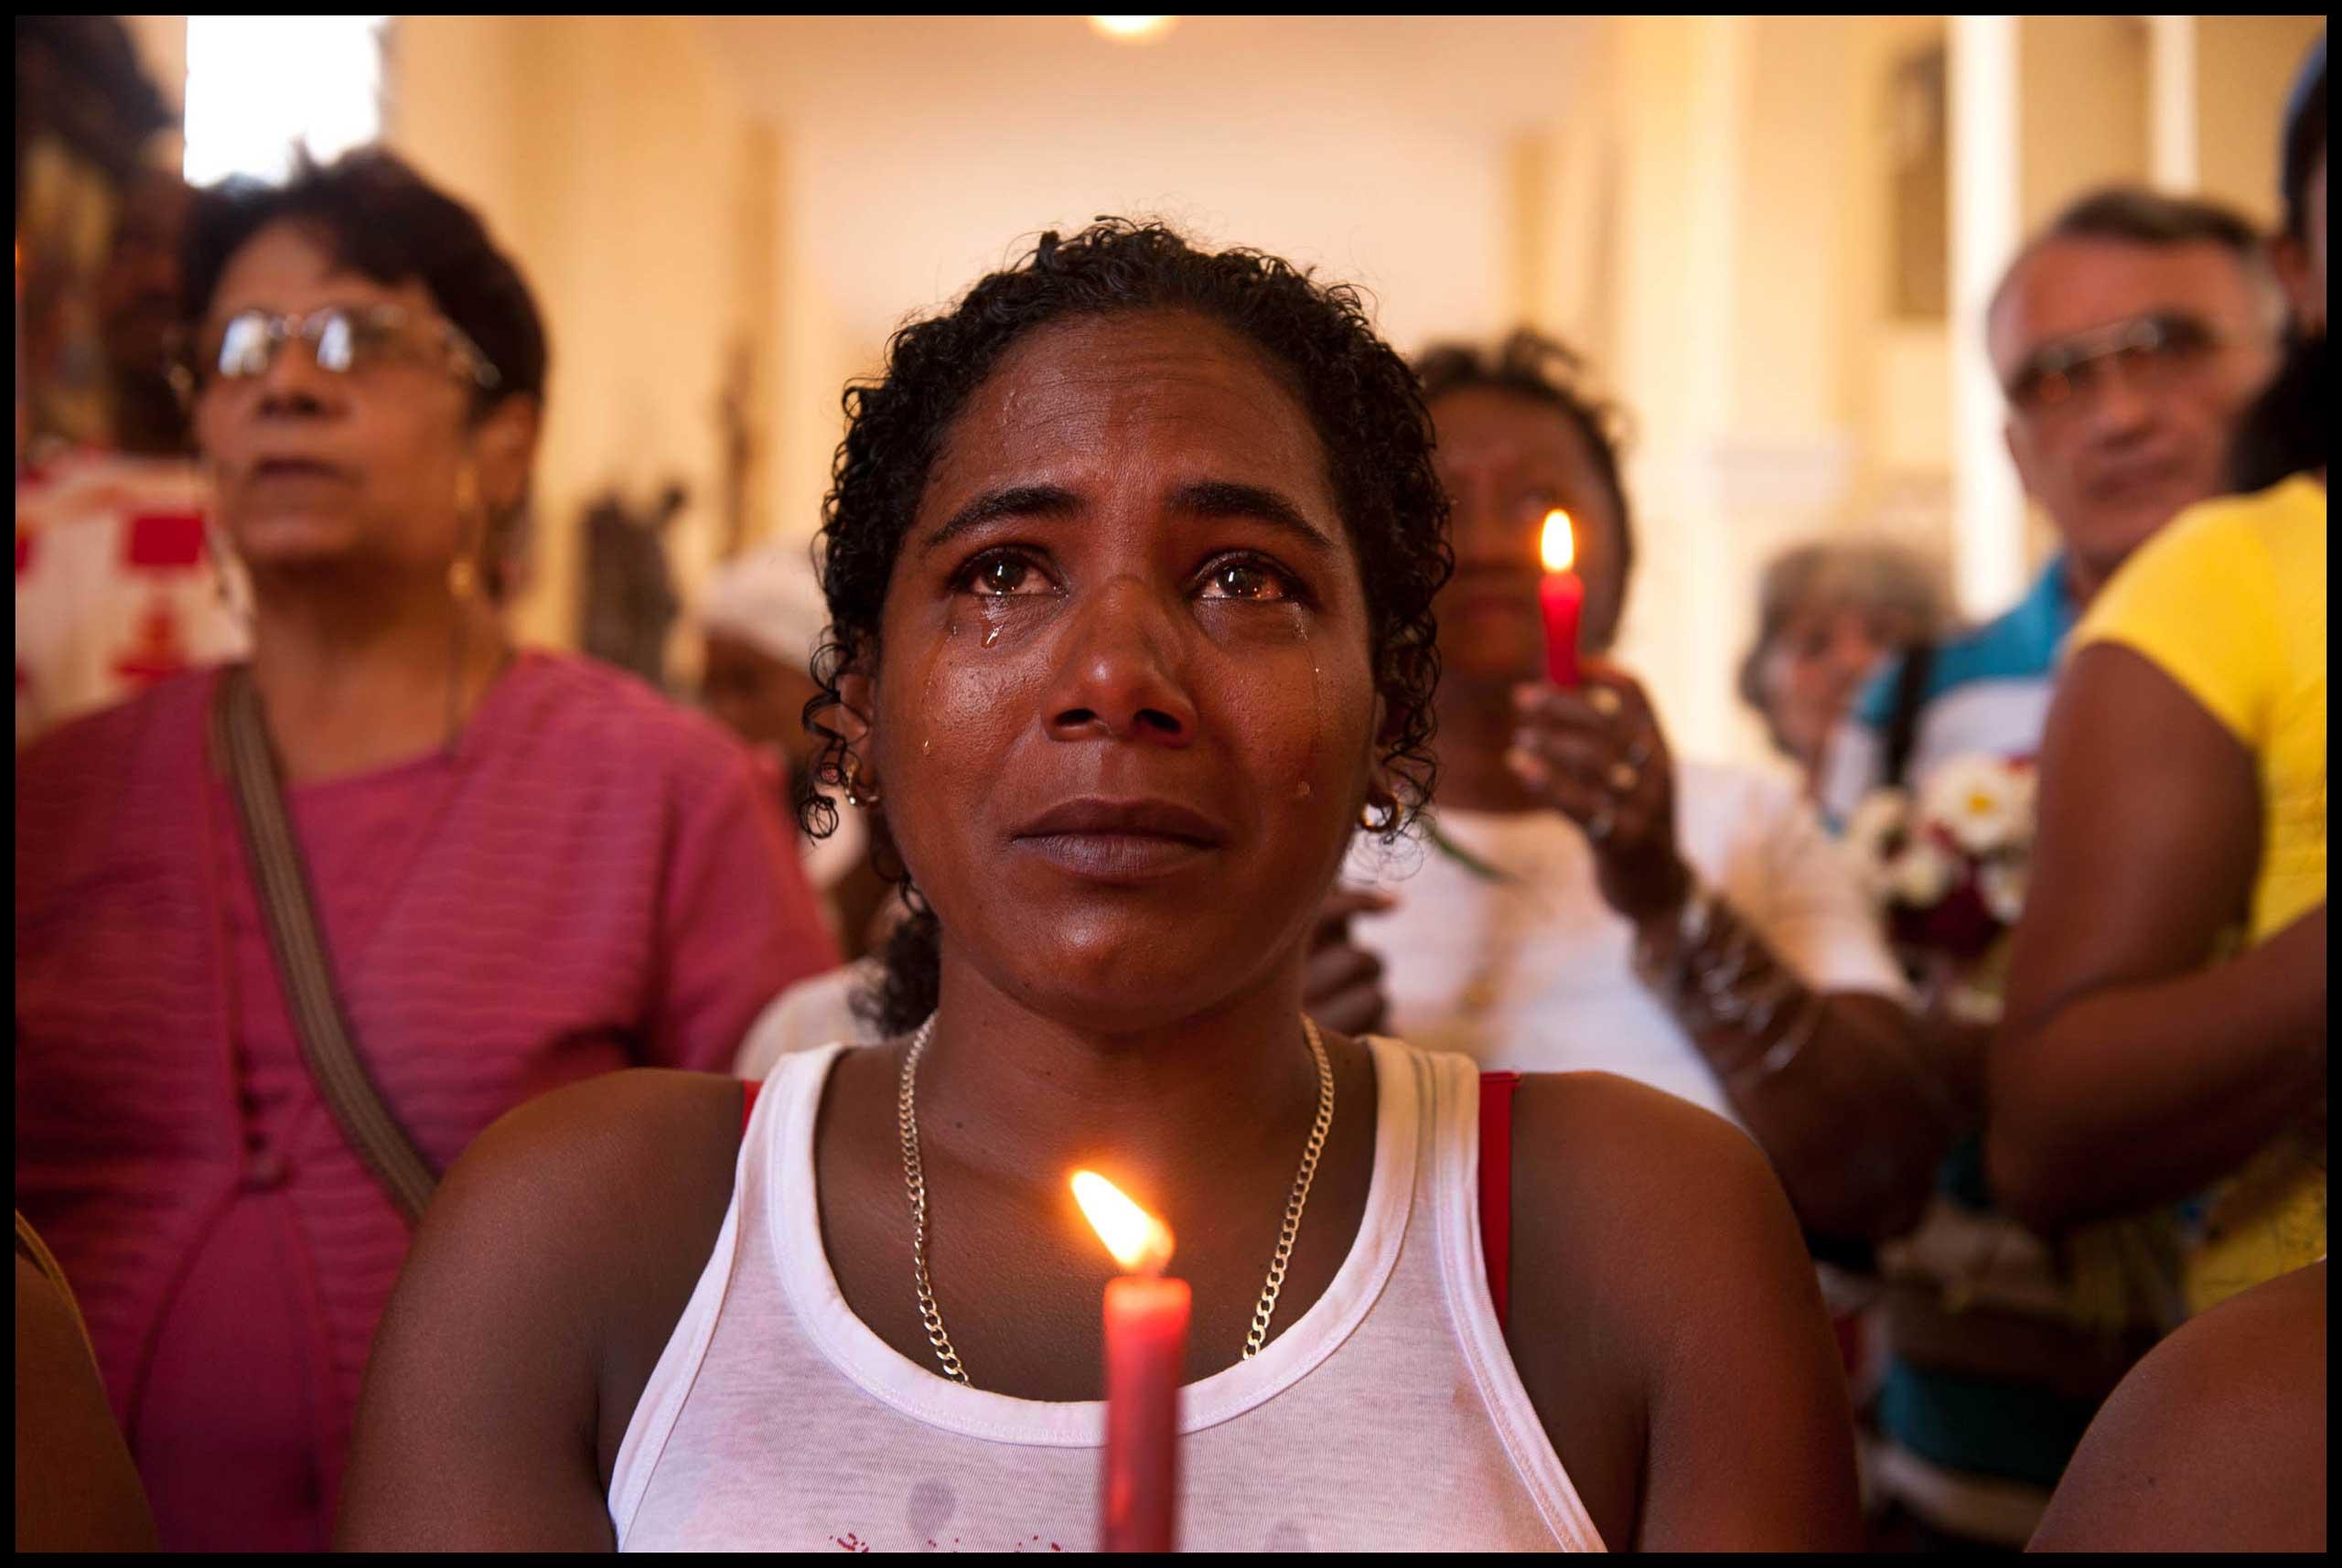 Iglesia de Santa Barbara, Parraga, Havana, 2013